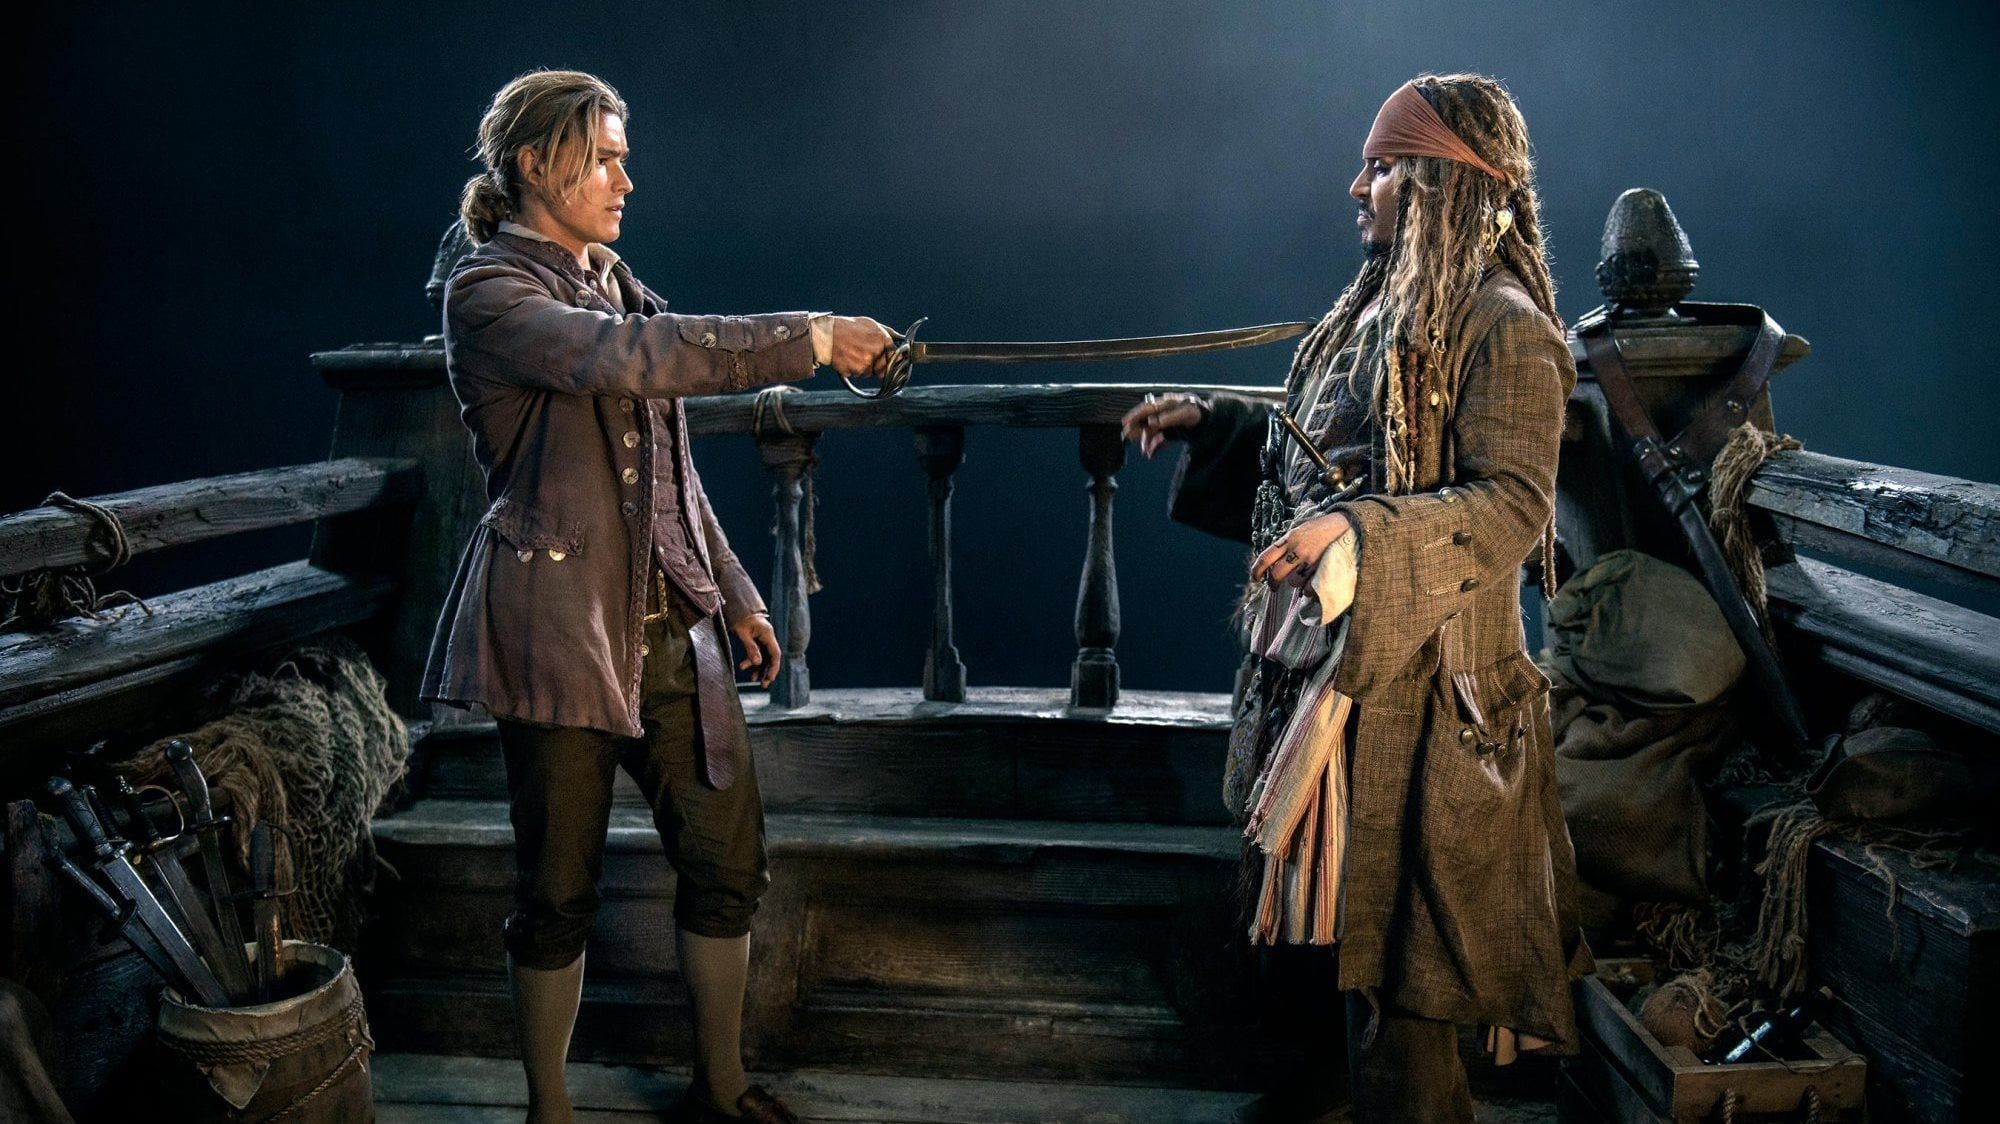 A Karib Tenger Kalozai Salazar Bosszuja 2017 Online Teljes Film Filmek Magyarul Letoltes Hd A Hanyatott Sorsu Jack Pirates Of The Caribbean Pirates Caribbean